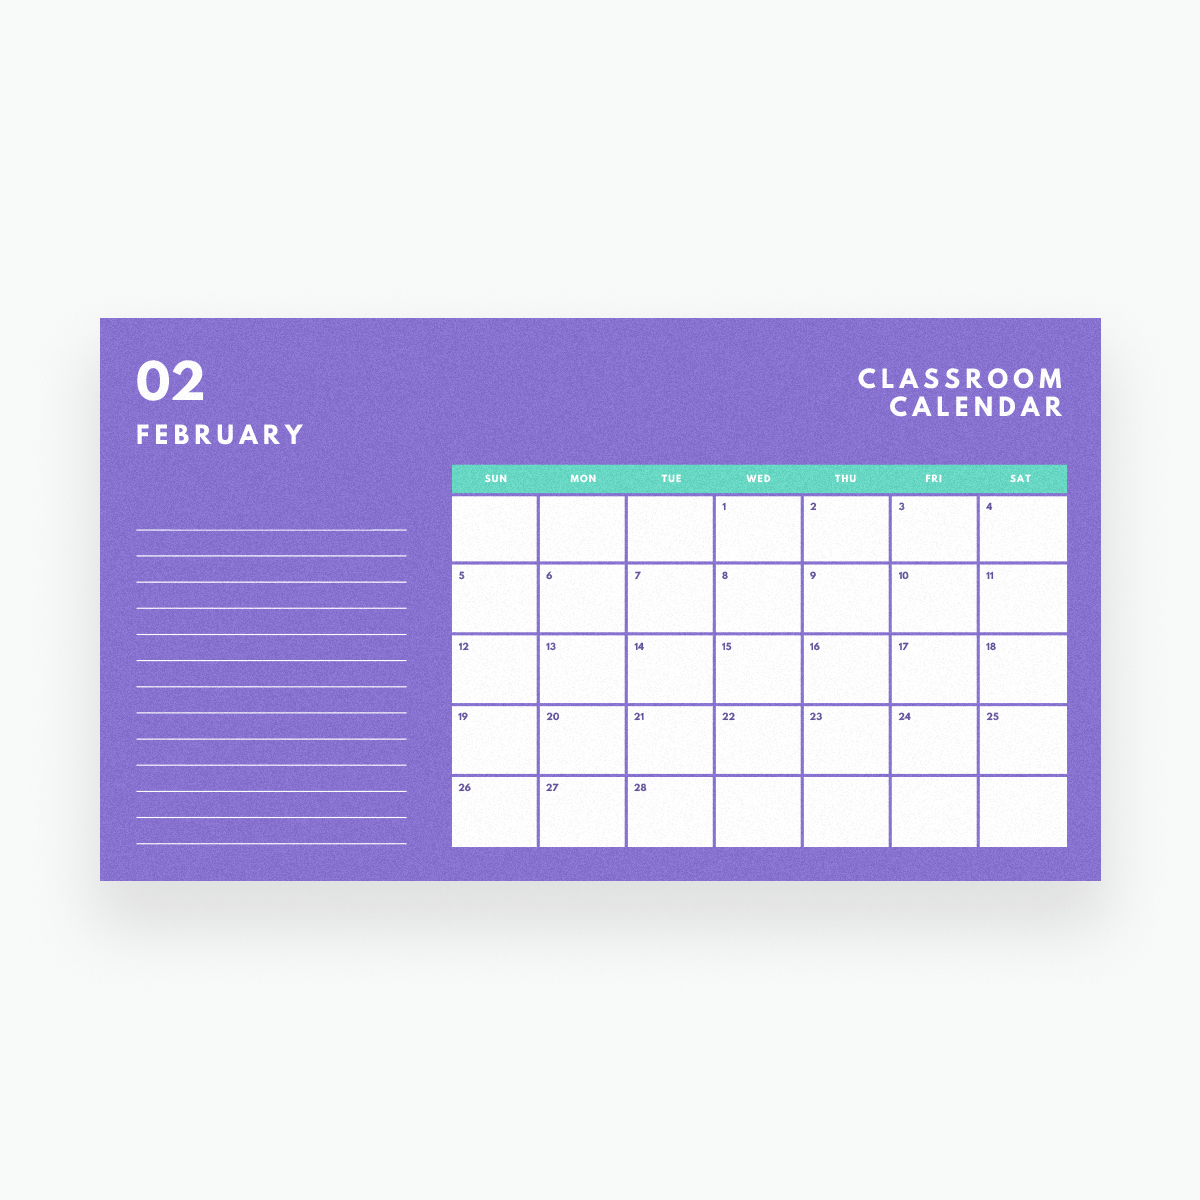 Free Online Calendar Maker: Design A Custom Calendar - Canva Calendar 2019 Generator